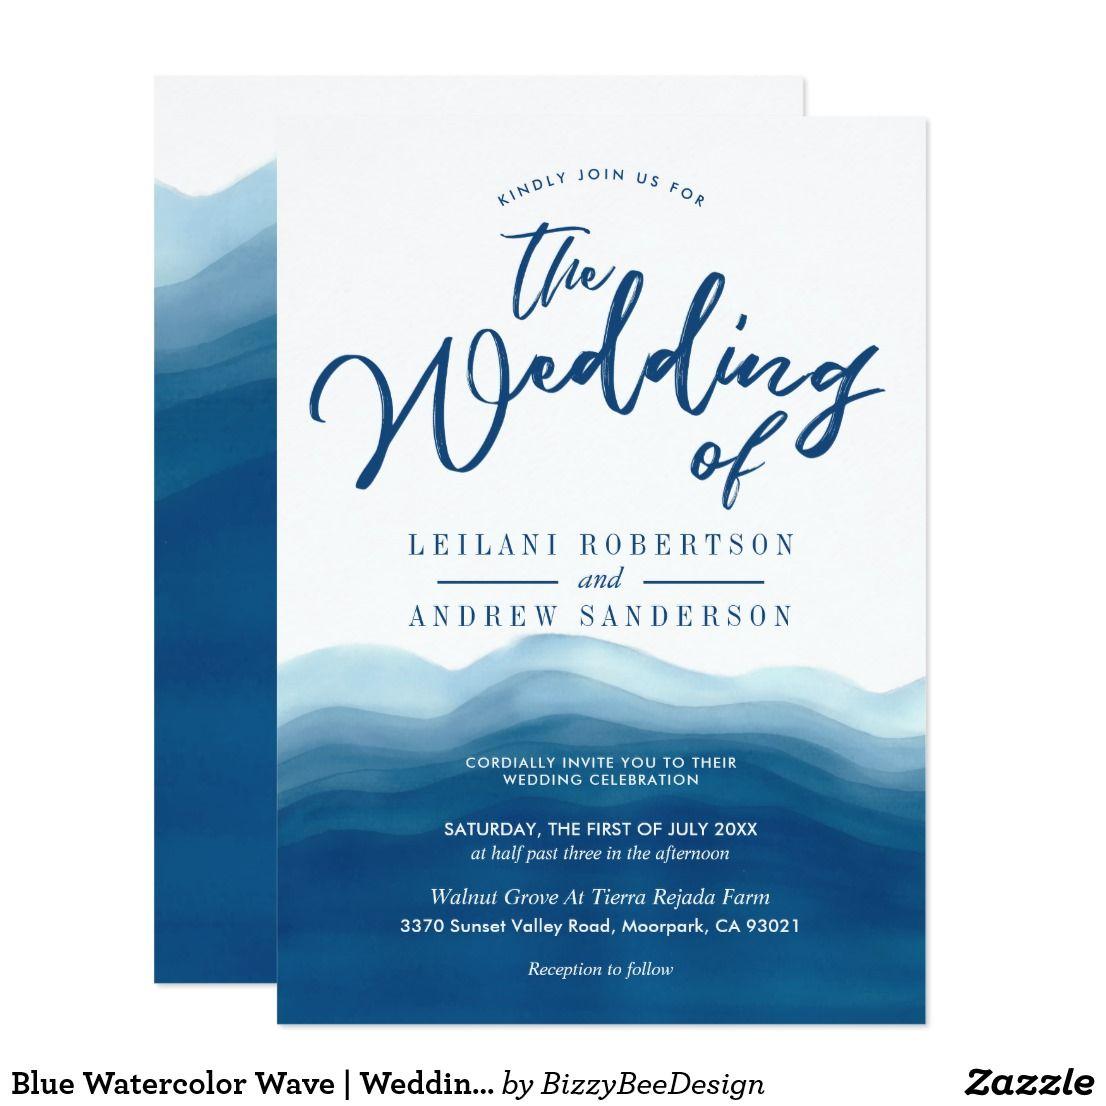 Vintage Waves Wedding Invitation Set  Beach Wedding Invitations Modern Beach Wedding Coastal Watercolor Aqua Romantic Bohemian Script